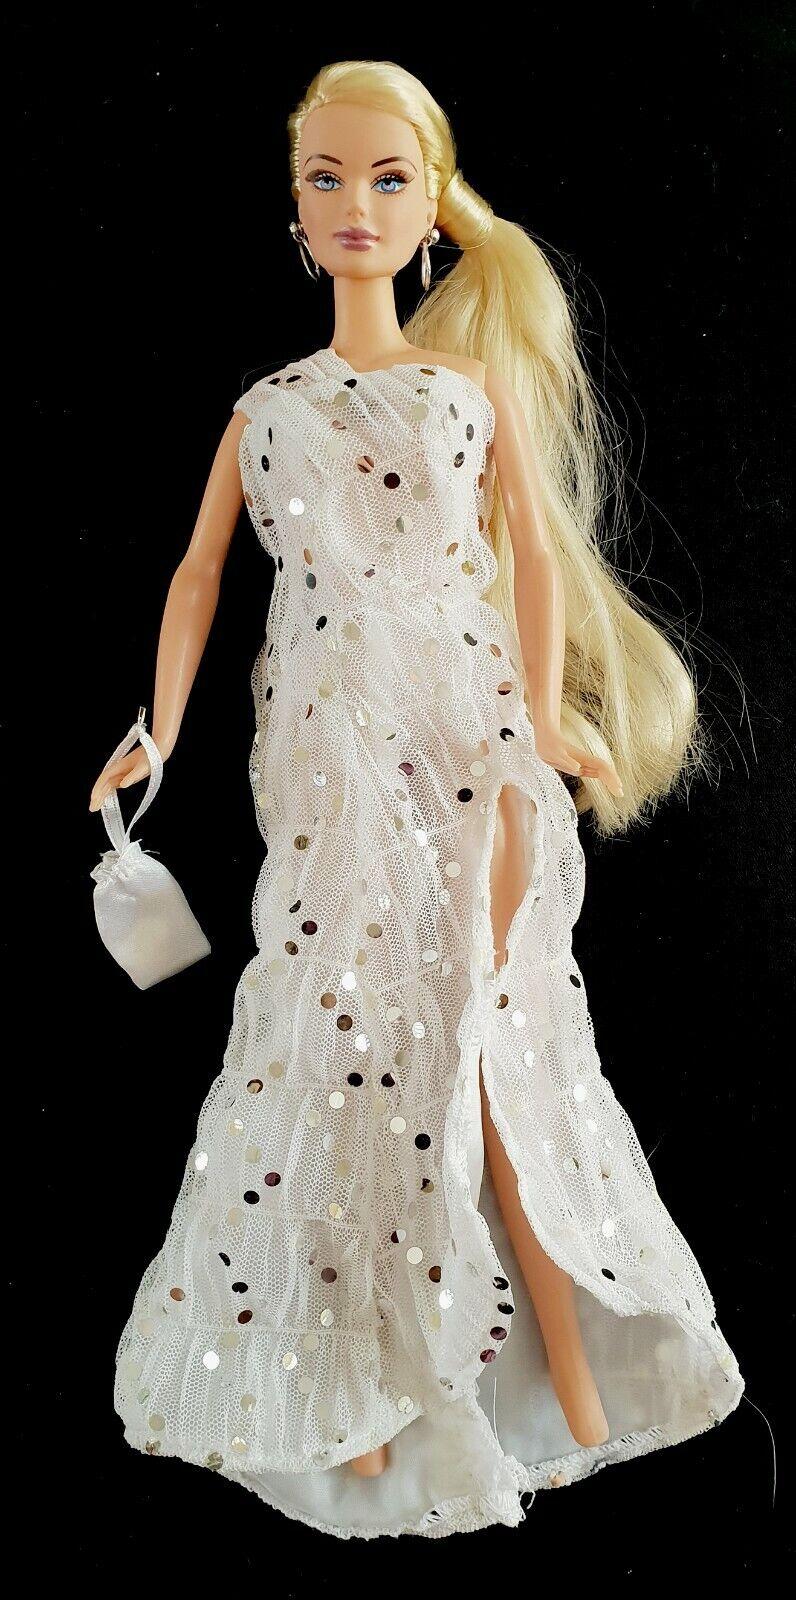 INTEGRITY giocattoli   bambola-bambola-puppe-poupee JANAY friend Giselle btutti moda bambola  risposta prima volta